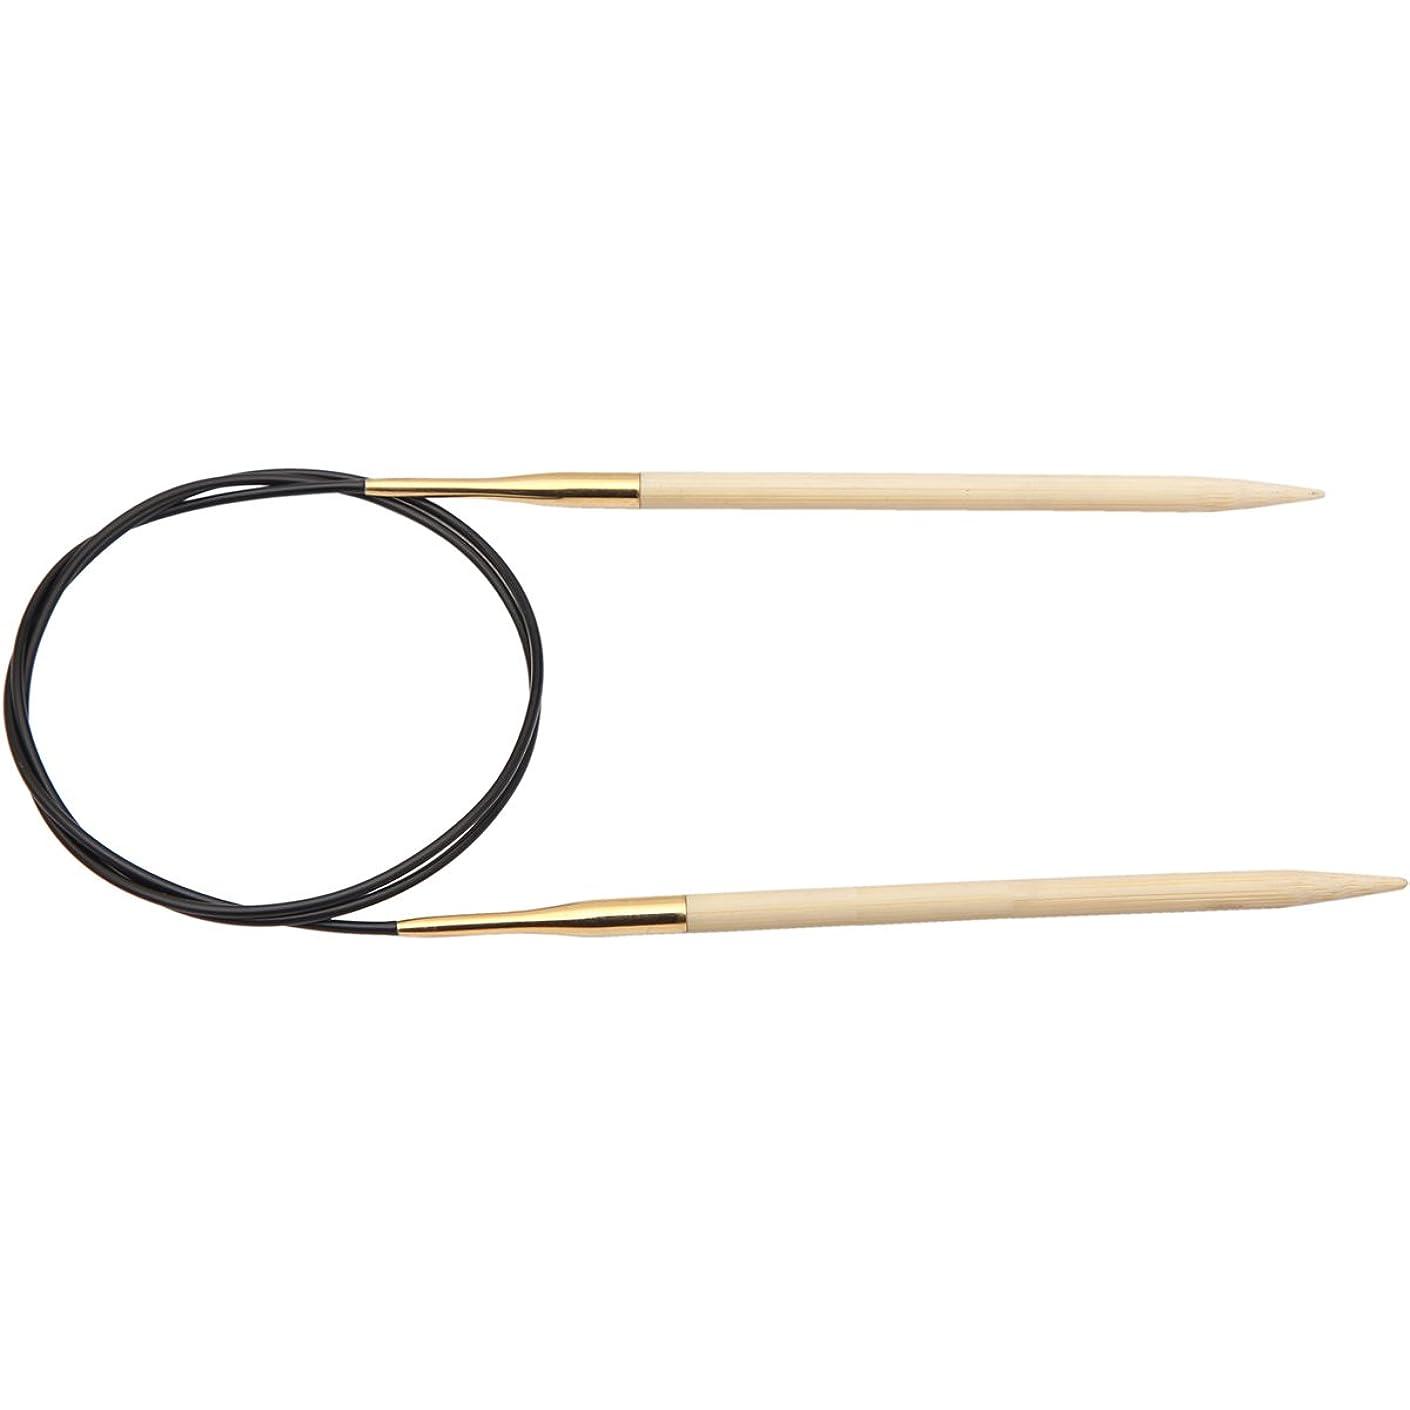 Knitter's Pride 7/40.5mm Bamboo Fixed Circular Needles, 16